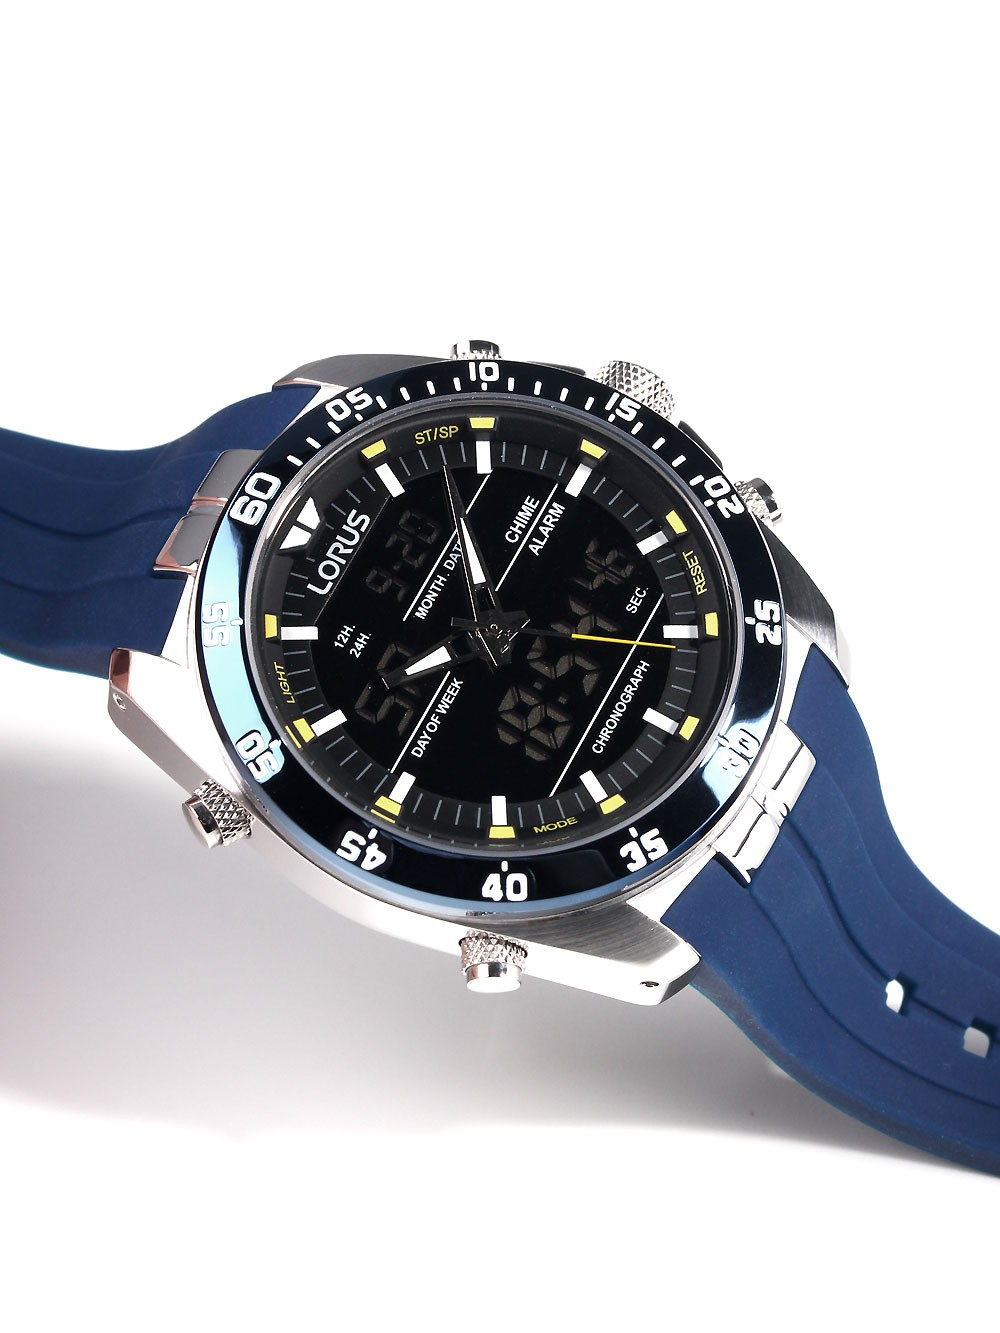 36386b937 Watches | Chrono12 - Lorus RW617AX9 Analog-Digital Alarm Chronograph ...